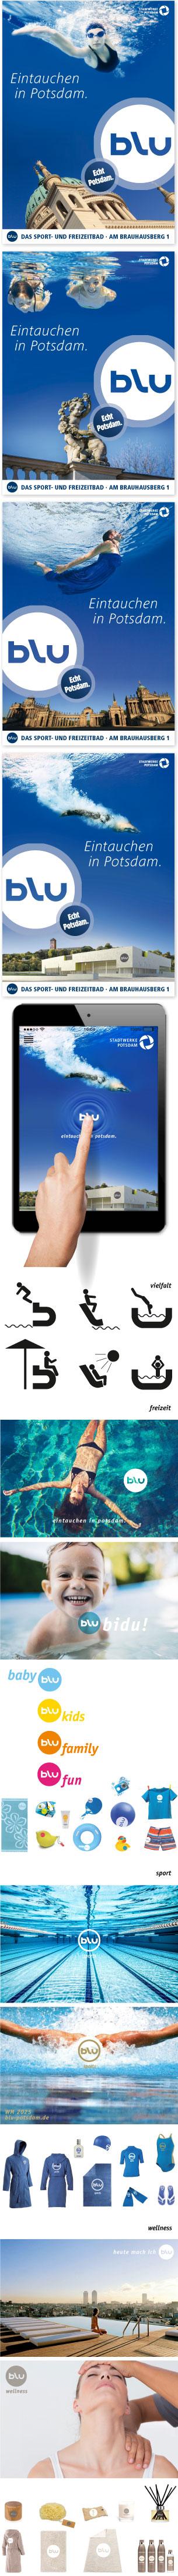 Naming Berlin, Logodesign Stadtwerke Potsdam, Kampagne by logolotte